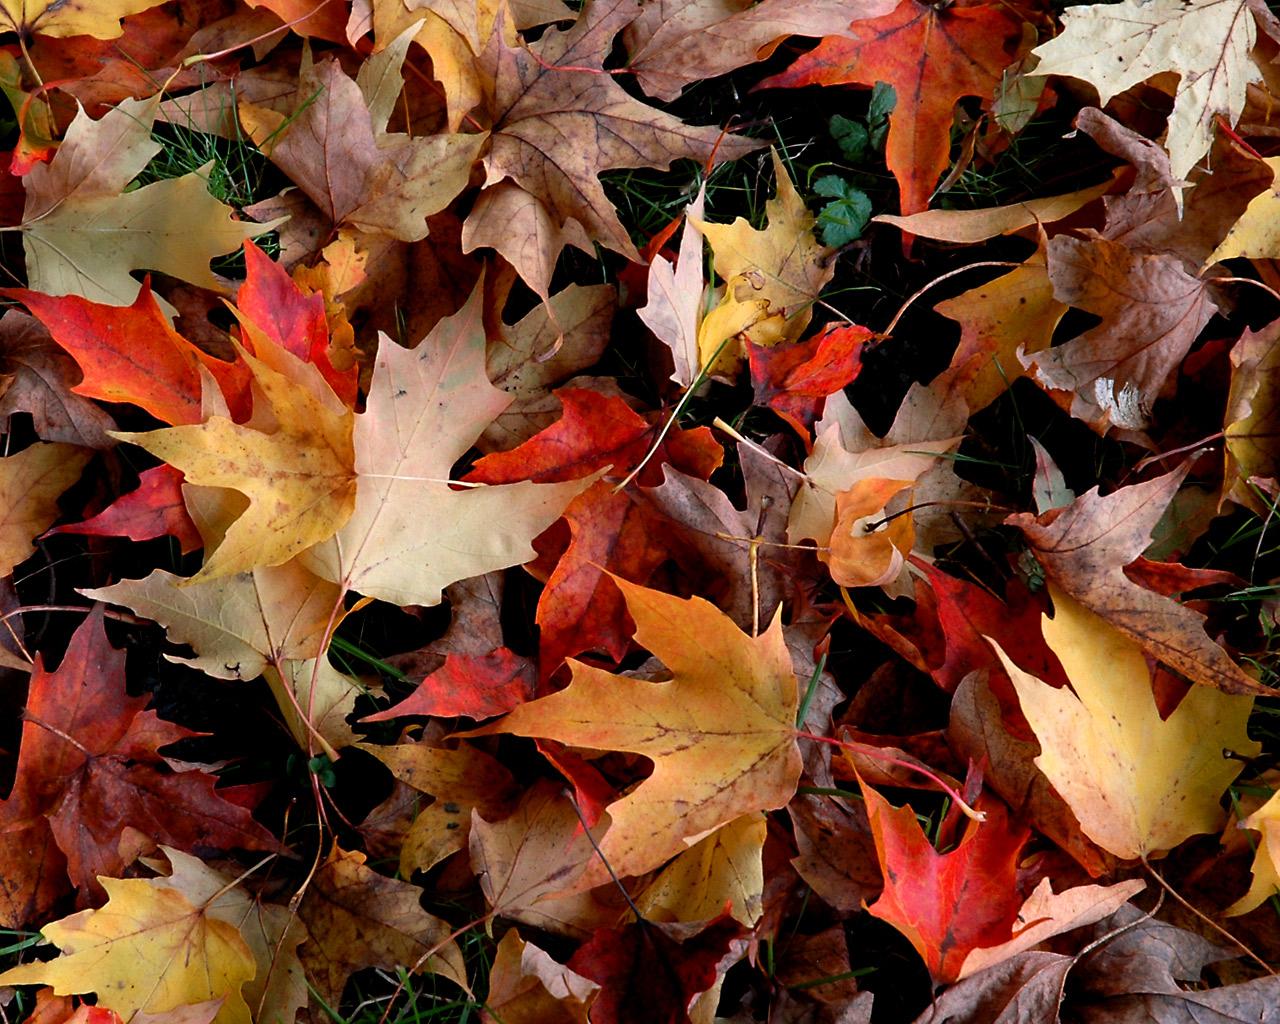 http://3.bp.blogspot.com/-_LHJLb9g8dk/TopNtYySh2I/AAAAAAAATig/LbnMKHncAfY/s1600/autumn-wallpaper.jpg